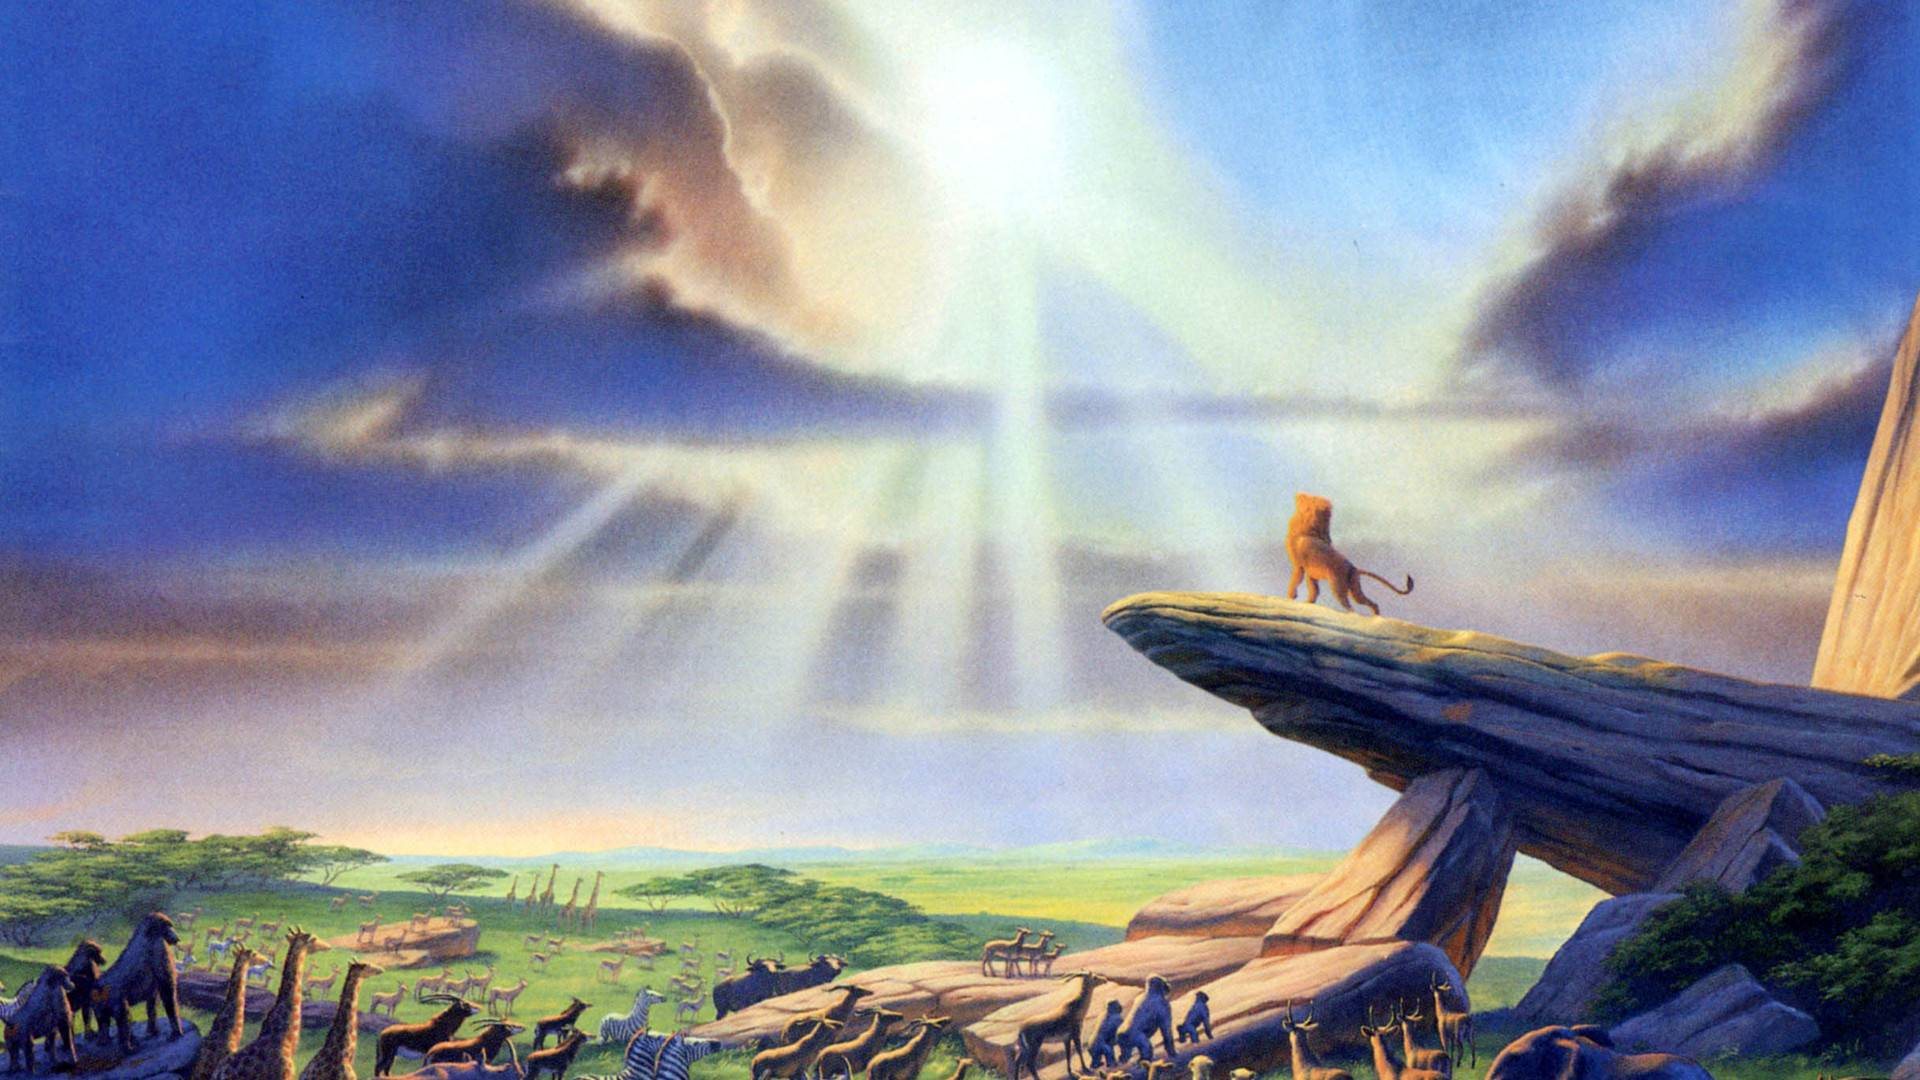 HD Simba Lion King Wallpapers Free | PixelsTalk Net